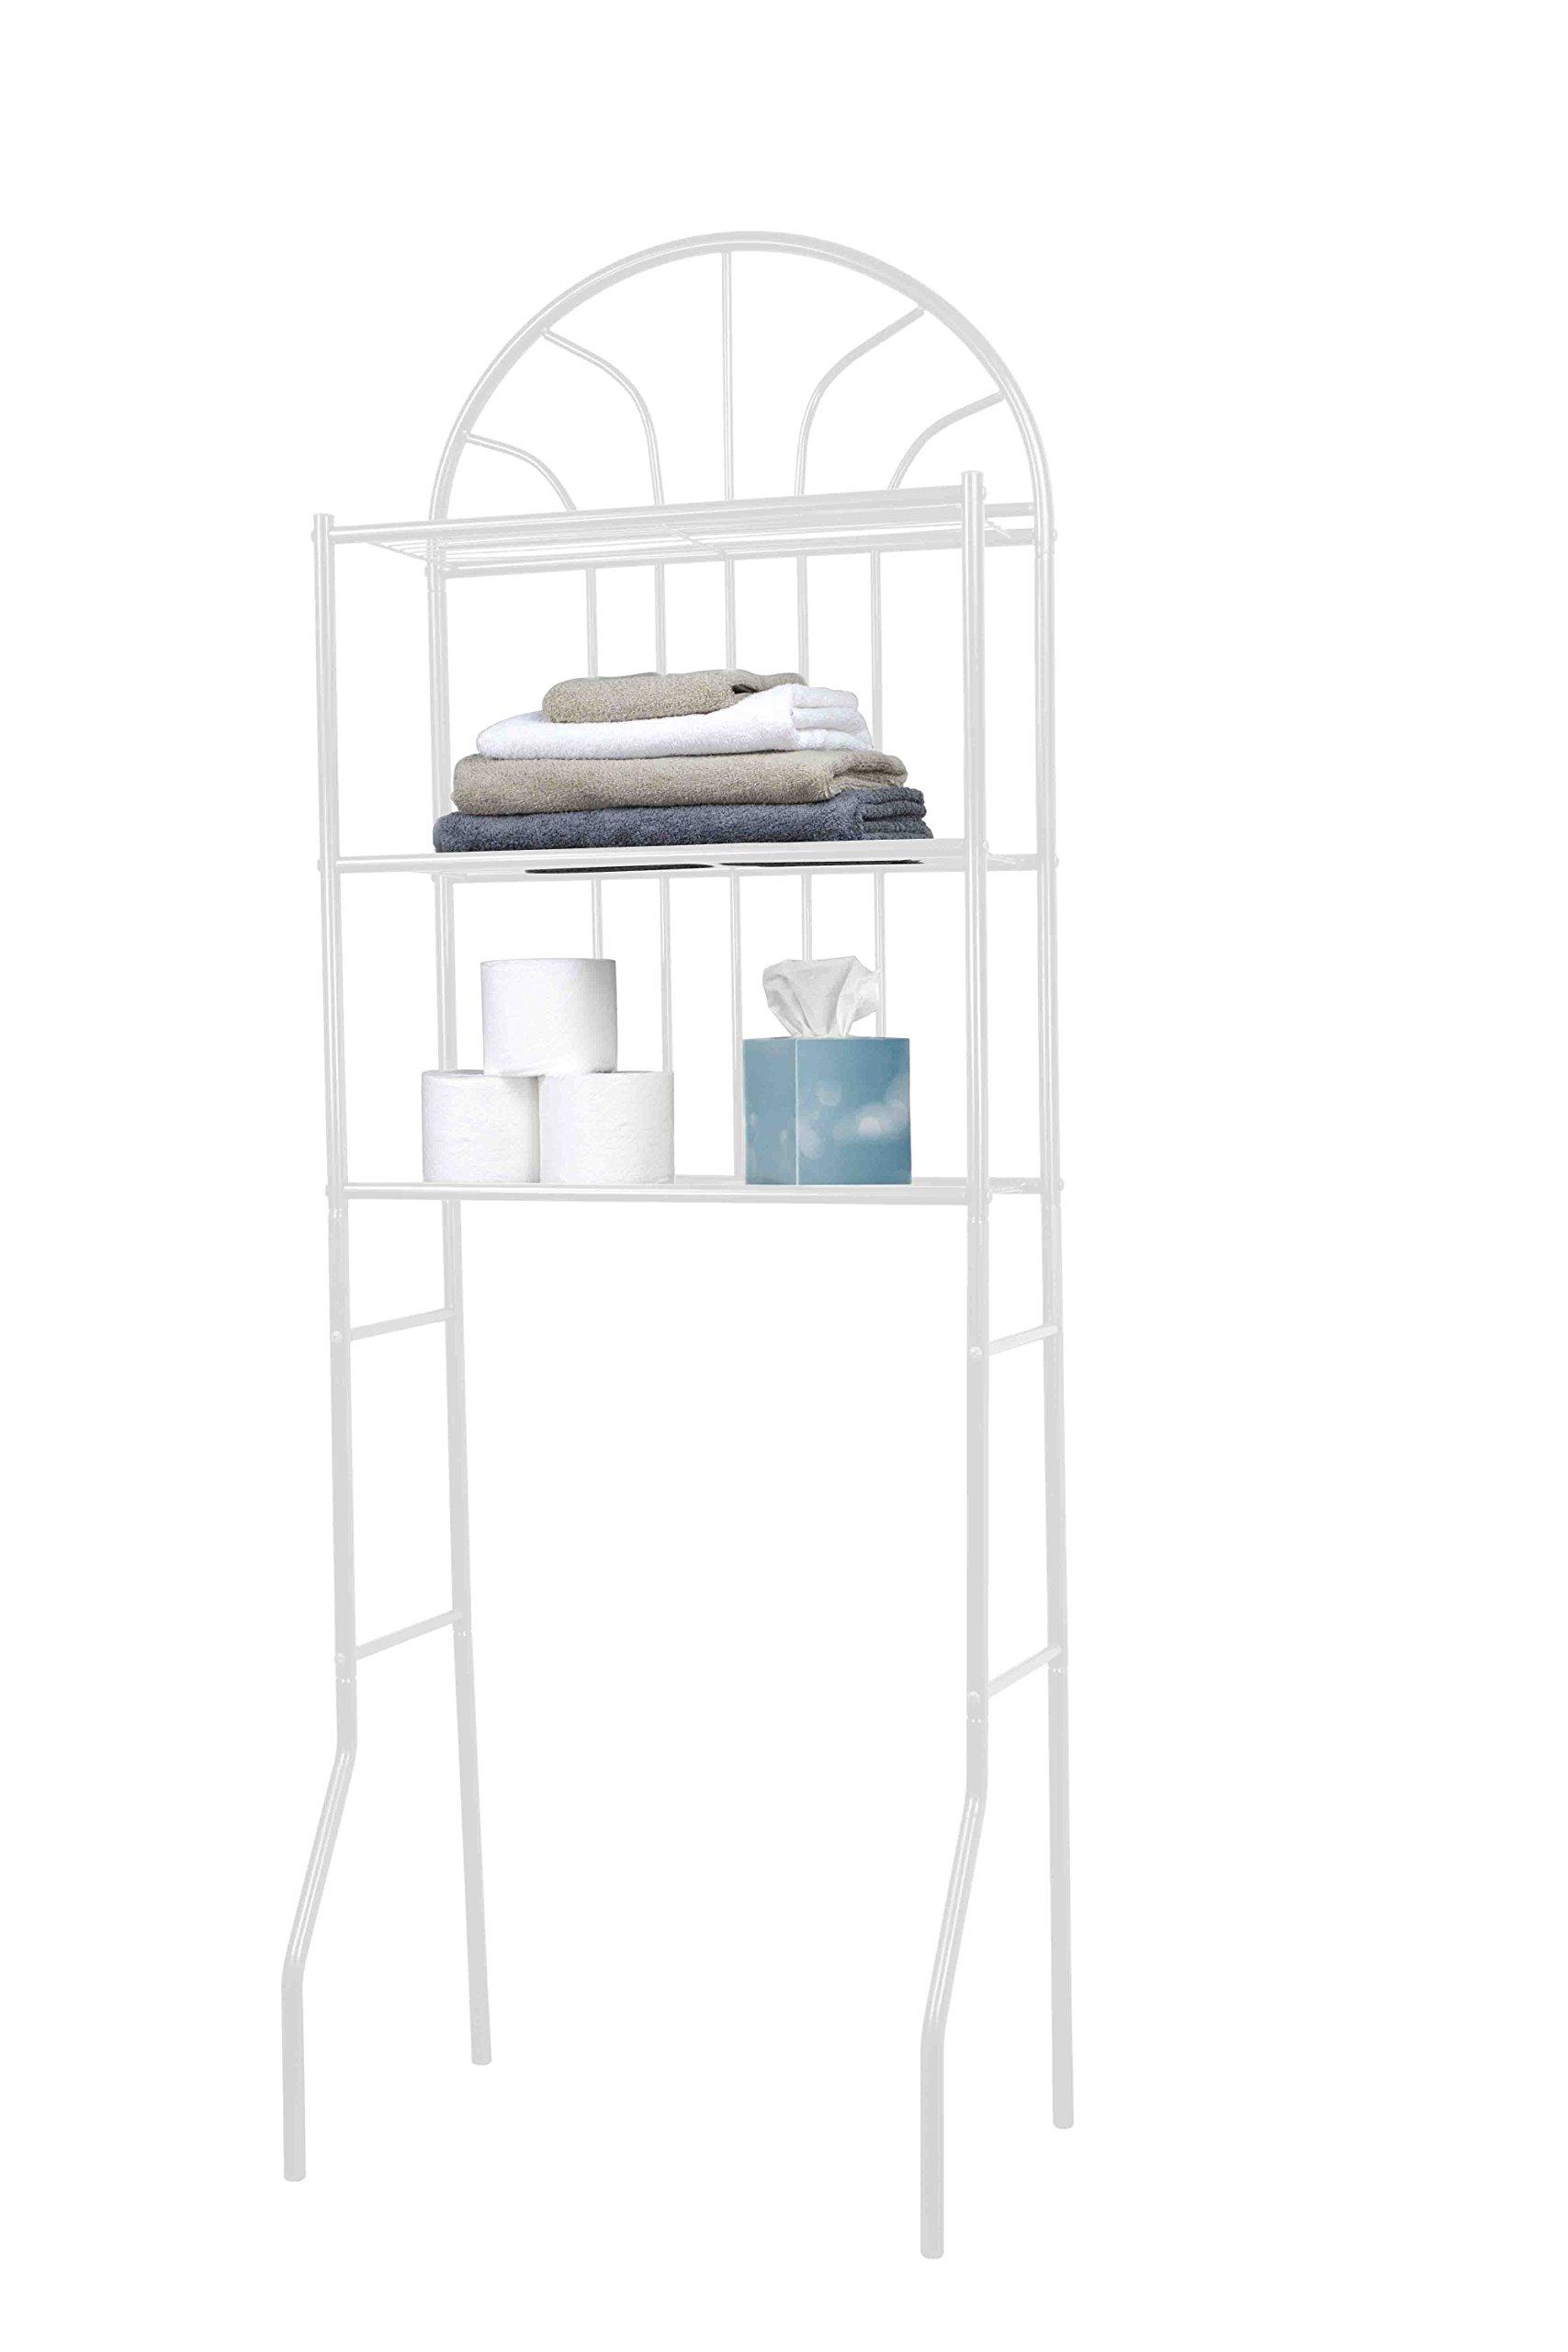 Home Basics 3 Over the Toilet Bathroom Space Saver Shelf, Bathroom Storage Shelf, White by Home Basics